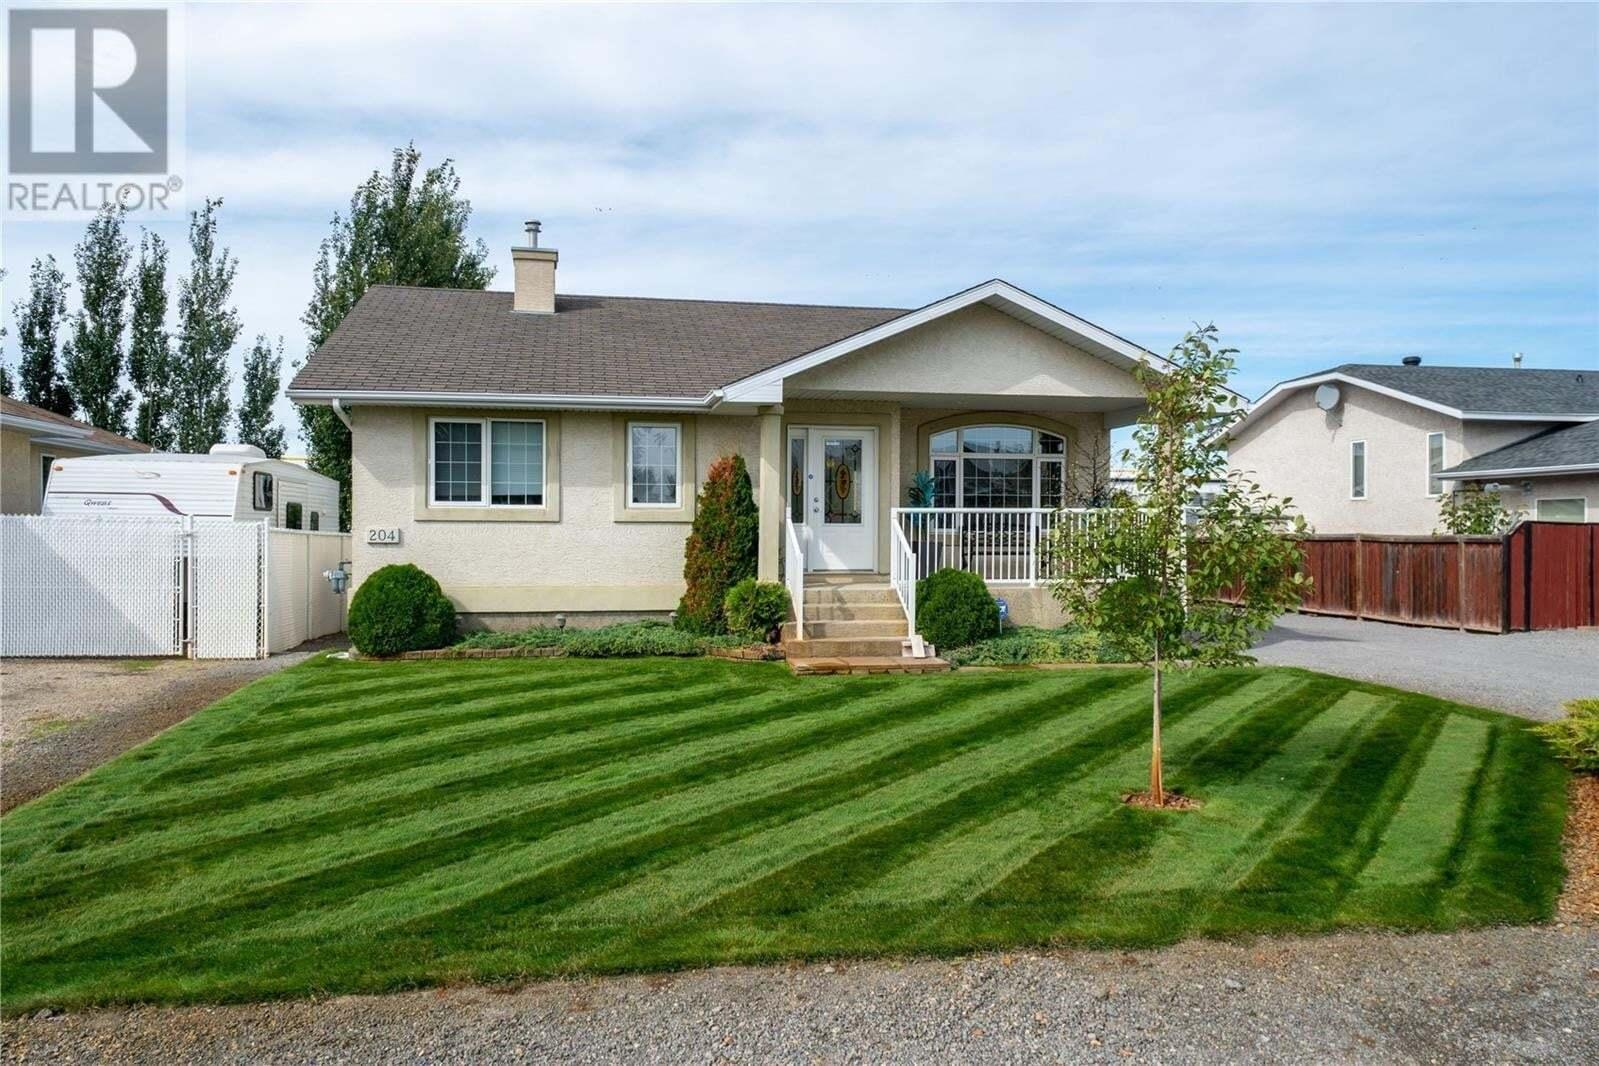 House for sale at 204 Arbor St Pilot Butte Saskatchewan - MLS: SK811476